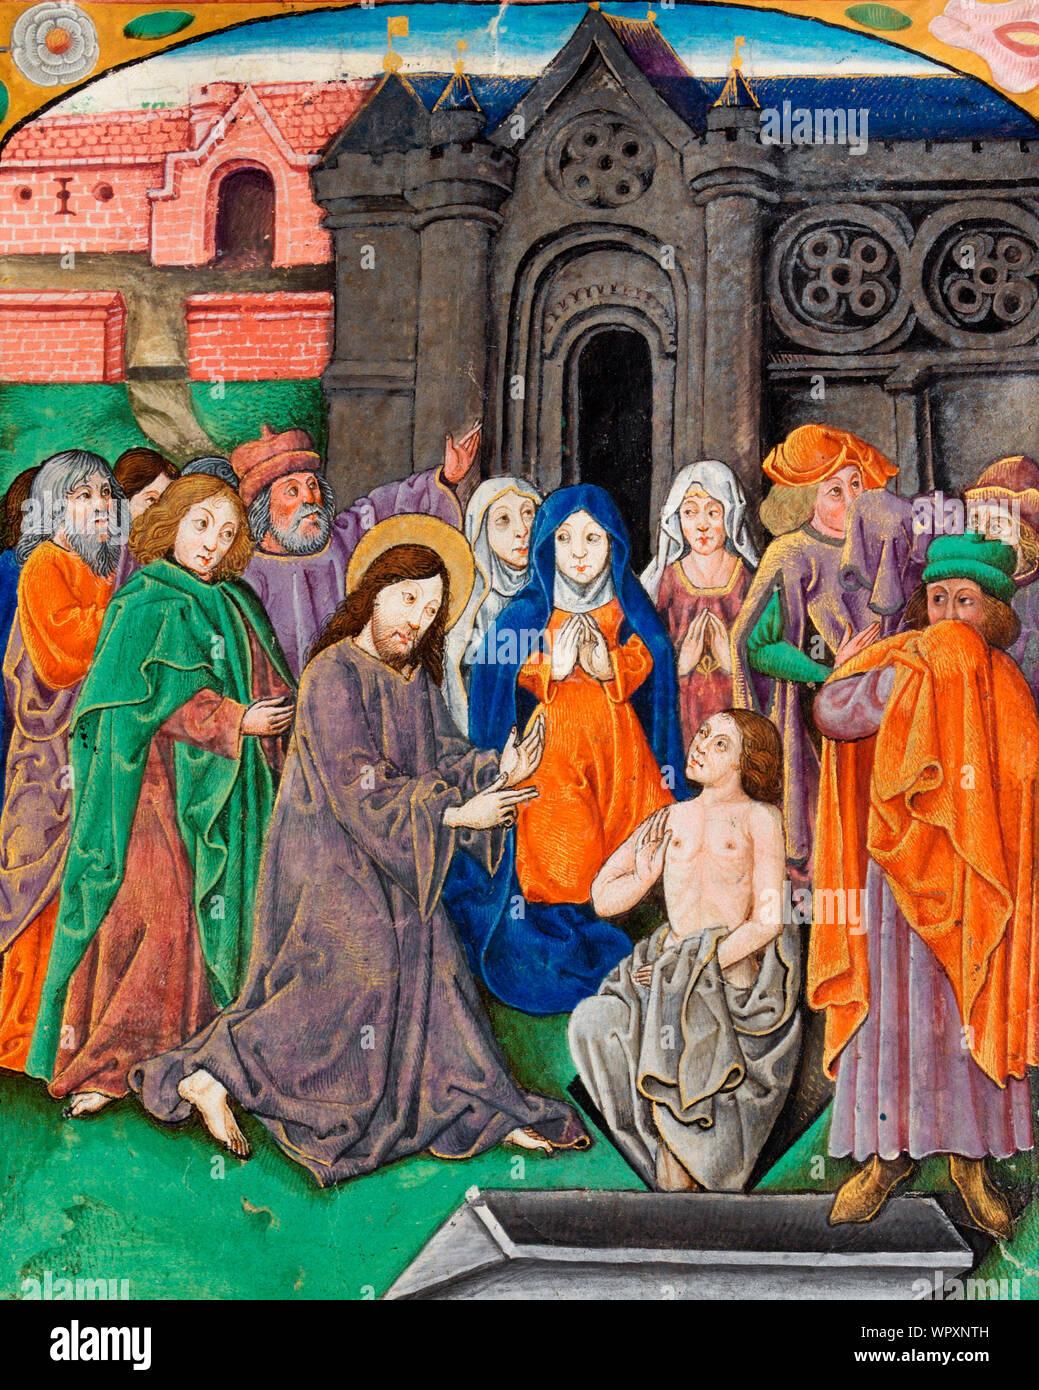 Raising of Lazarus by Jesus Christ Stock Photo